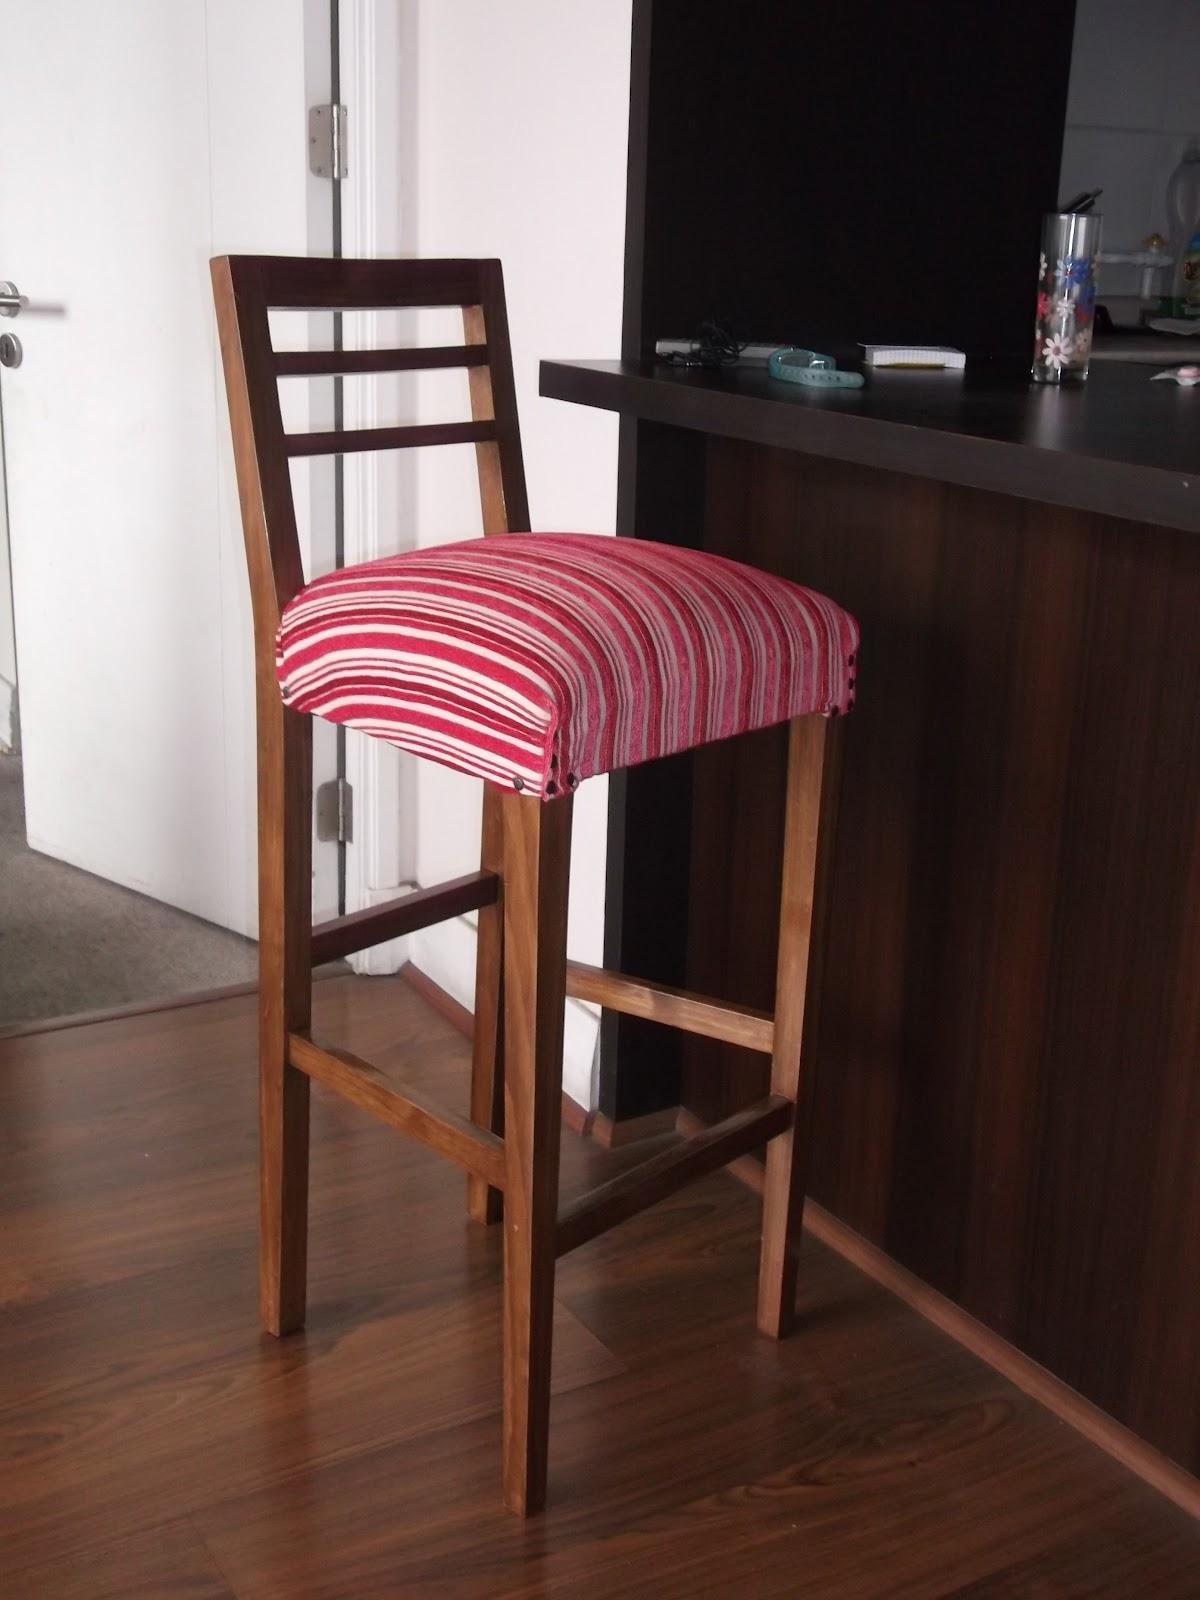 Emejing Sillas Para Cocina Pictures - Casa & Diseño Ideas ...